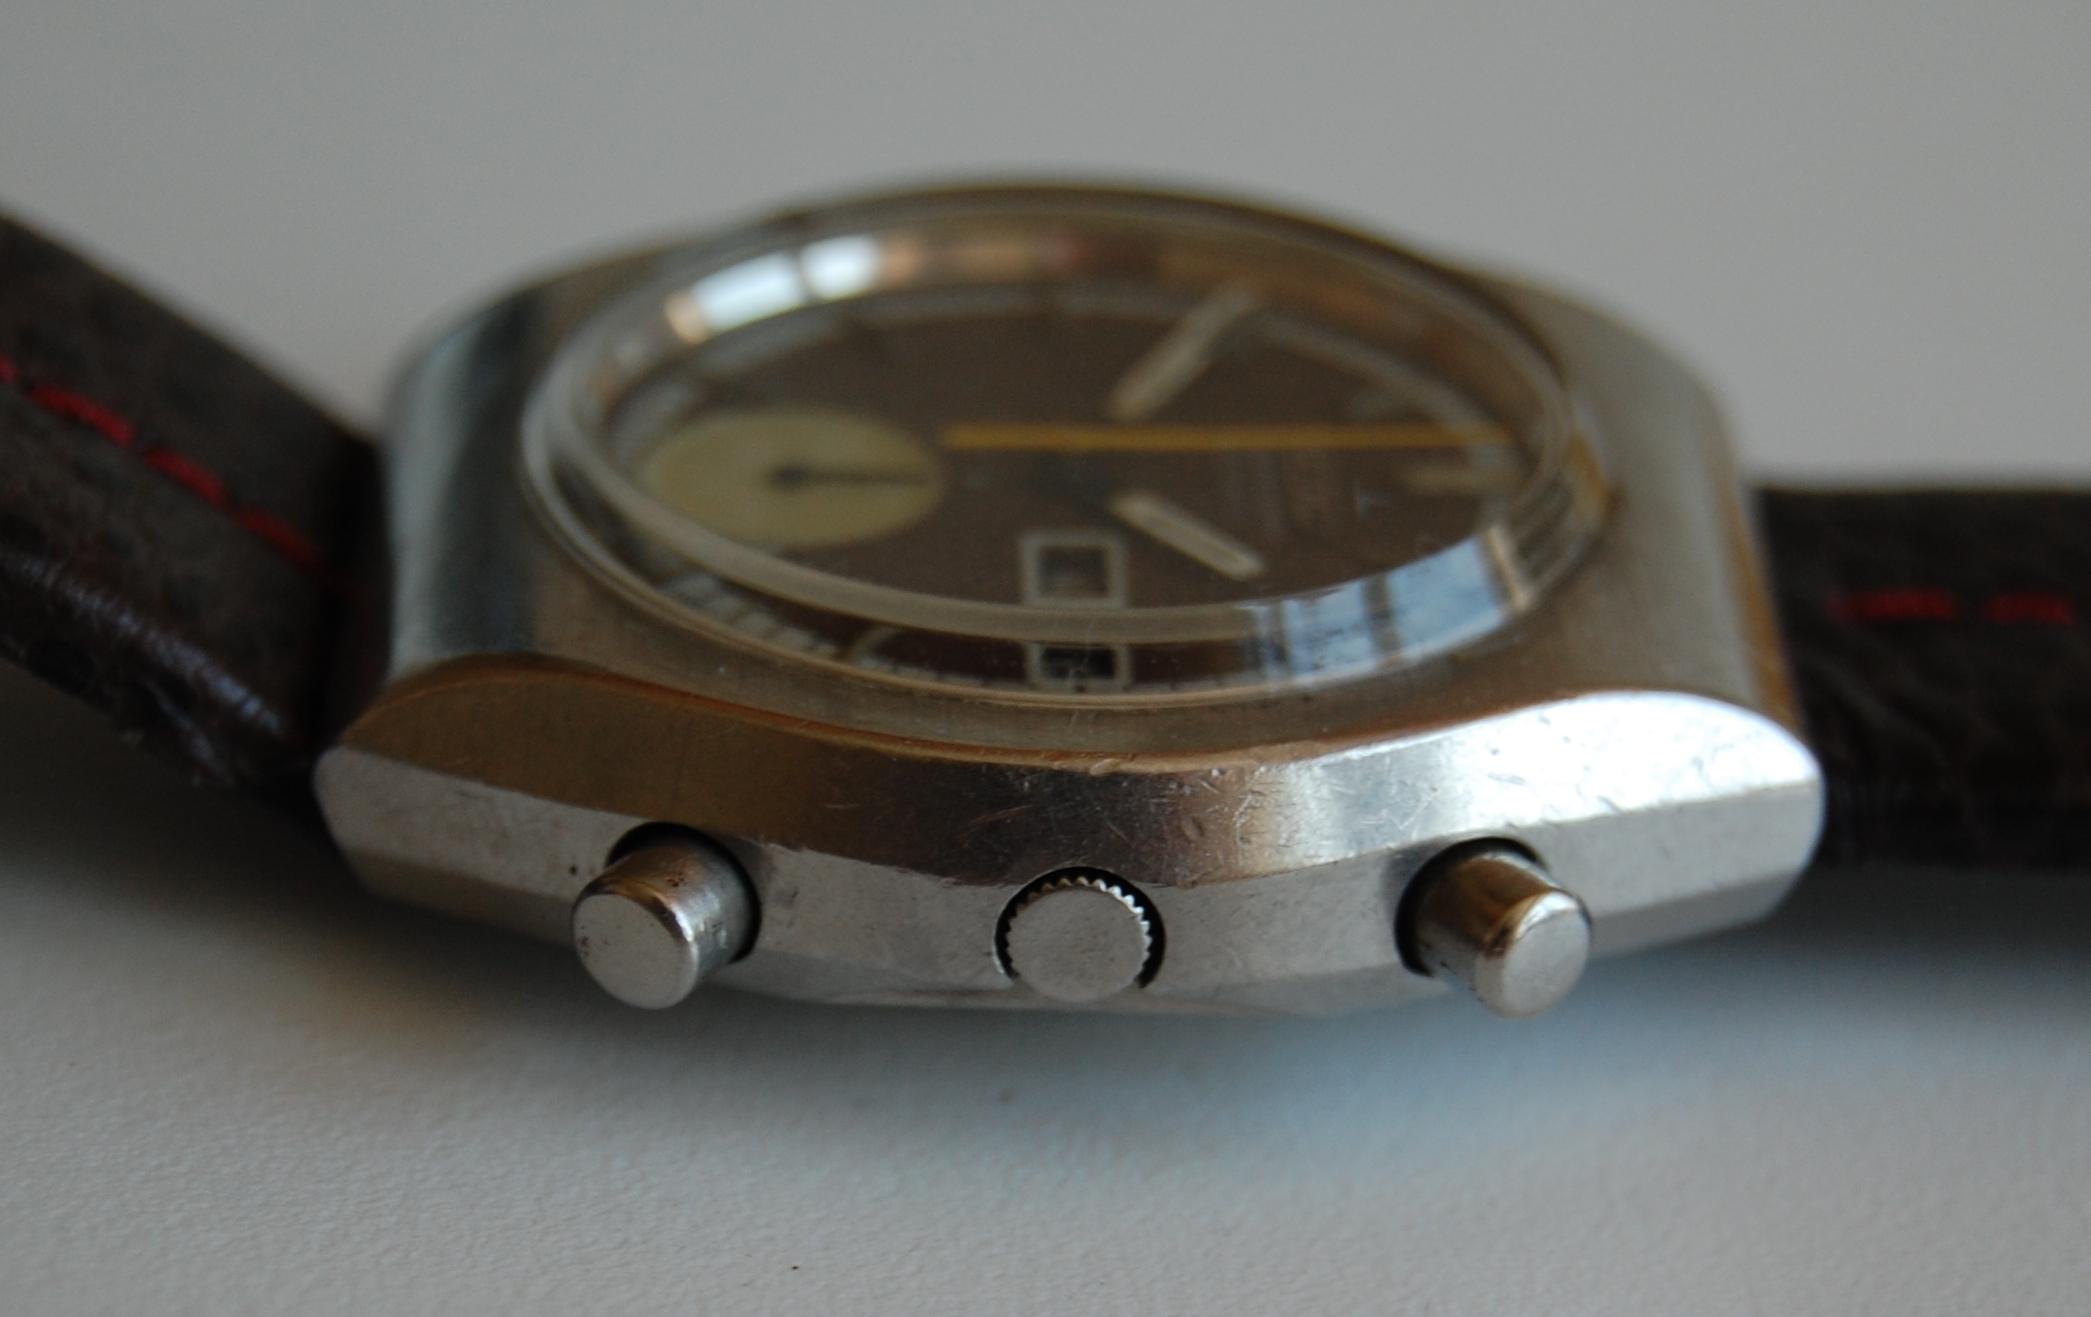 1974 Seiko 6139 8020 Chronograph - Birth Year Watches